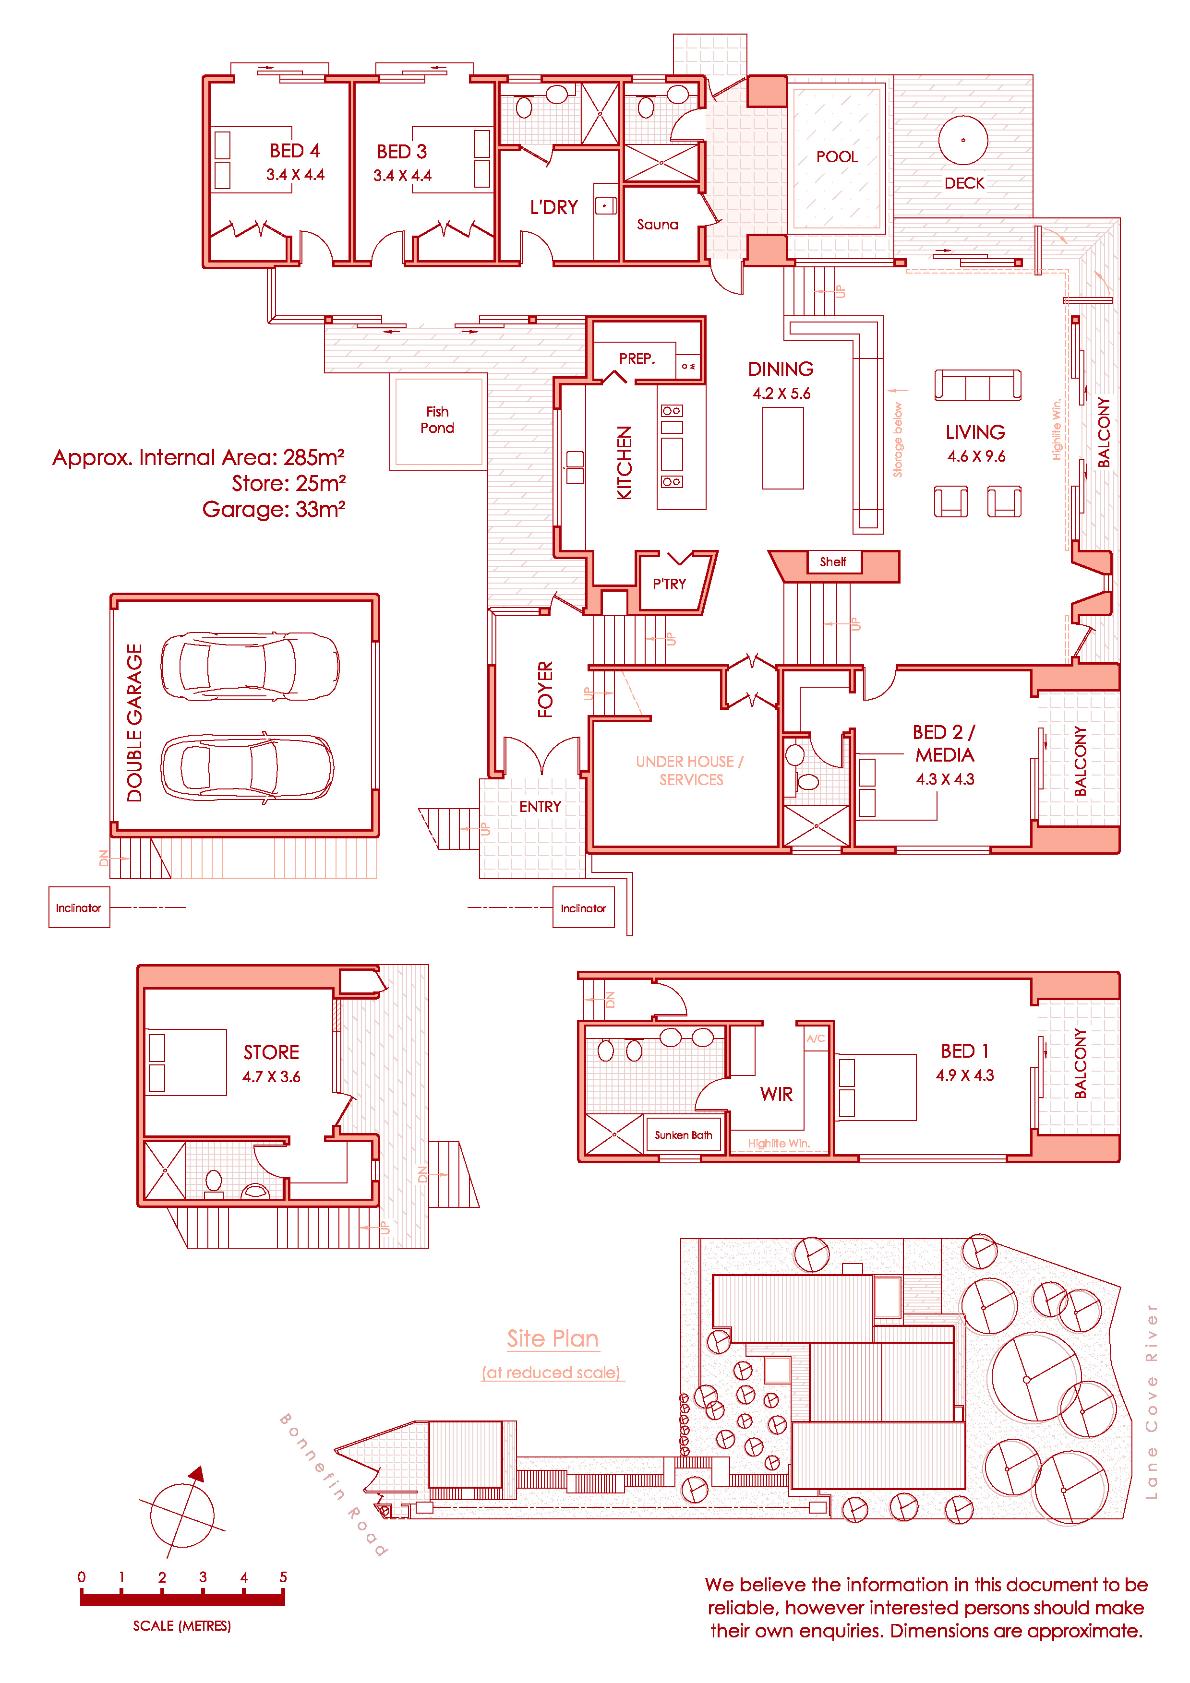 design-estate REAL ESTATE - 35 Bonnefine Rd, Hunters Hill floorplan1.jpg